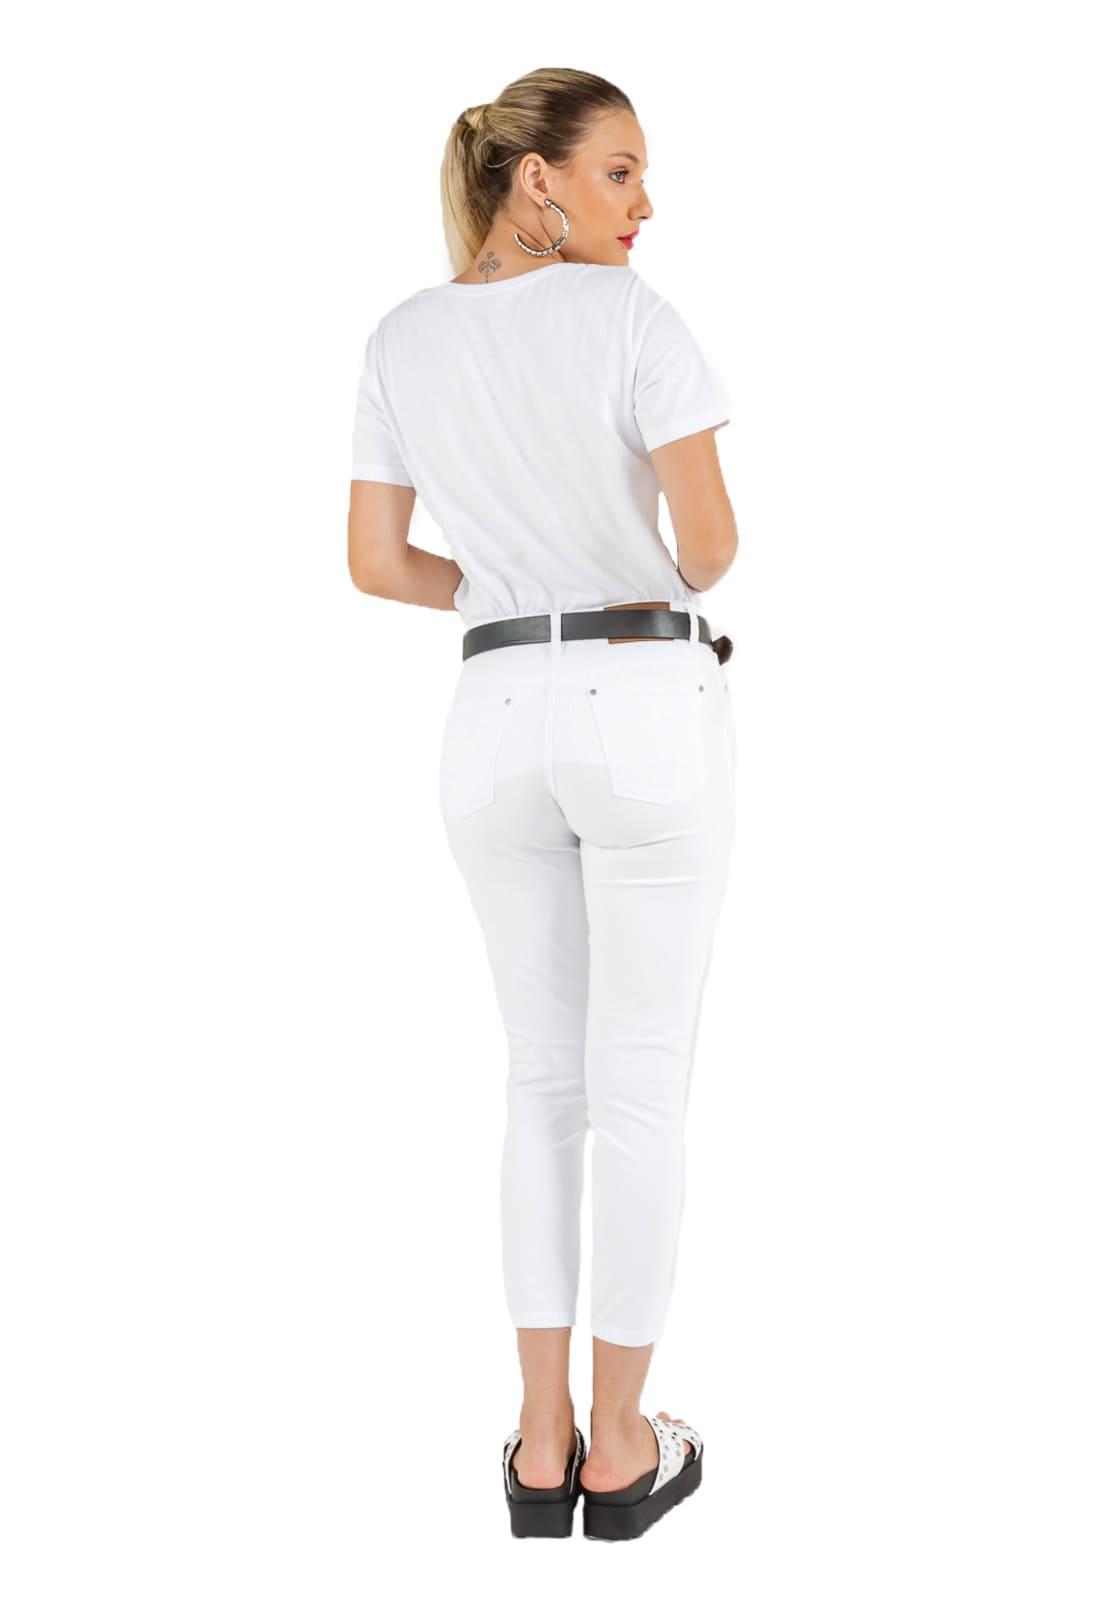 Calça Feminina Tradicional Cropped - Sarja Branco